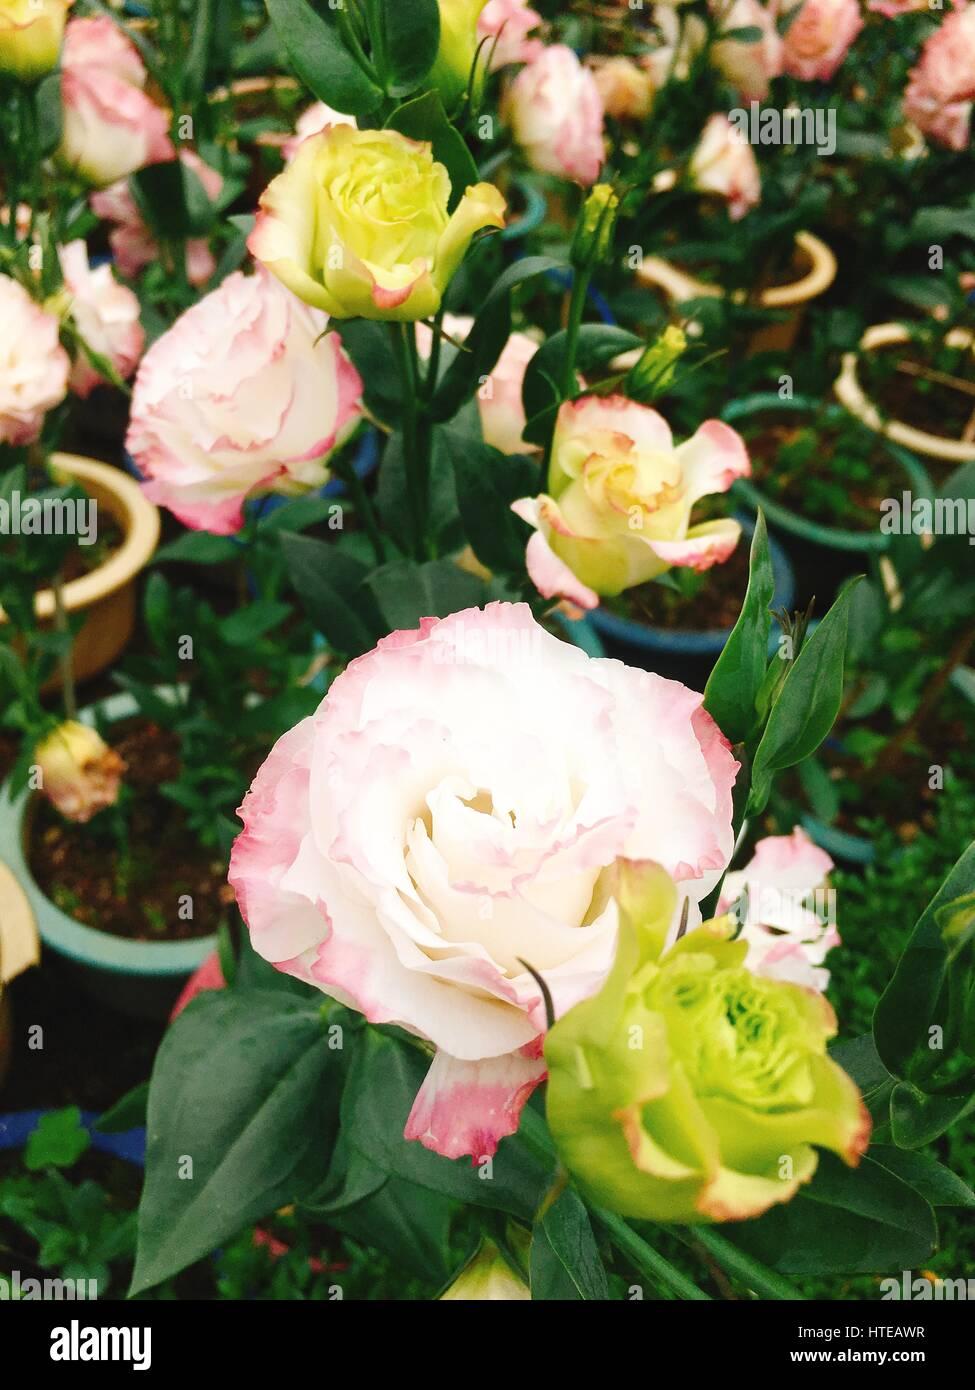 Prairie gentian or lisianthus flower - Stock Image